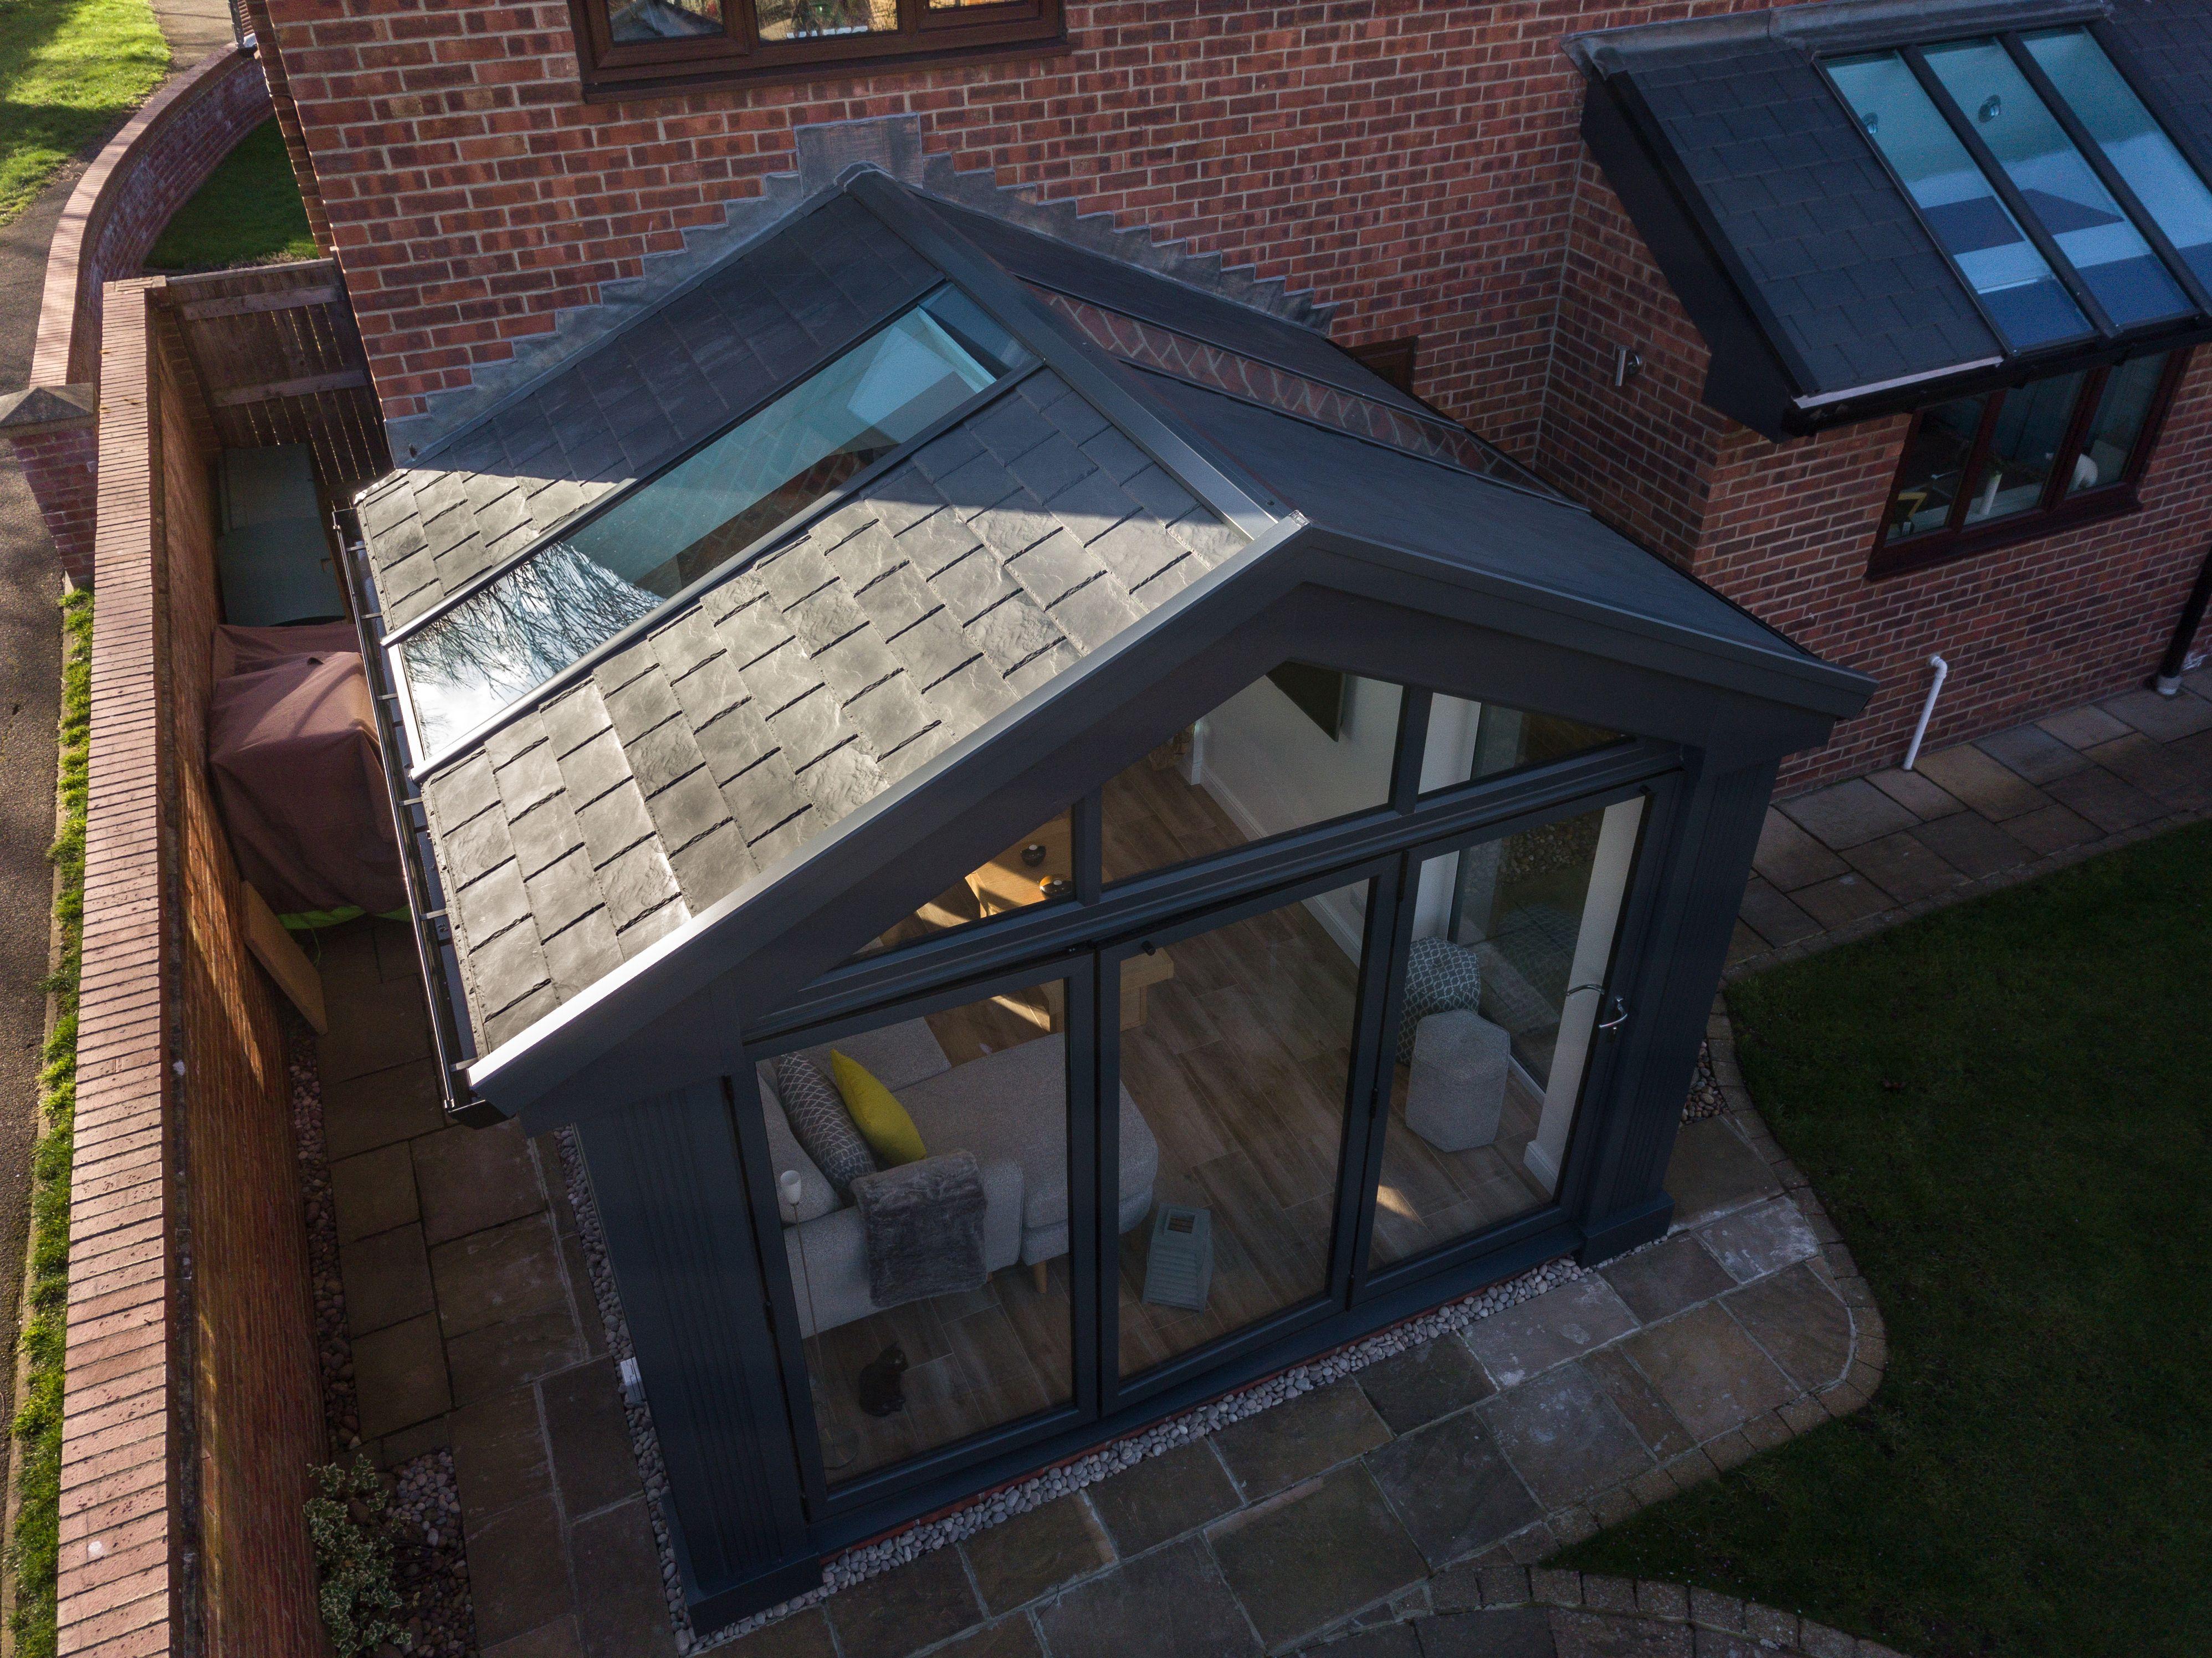 Tiled Conservatory Roof Conservatory Roof Tiled Conservatory Roof Garden Room Extensions